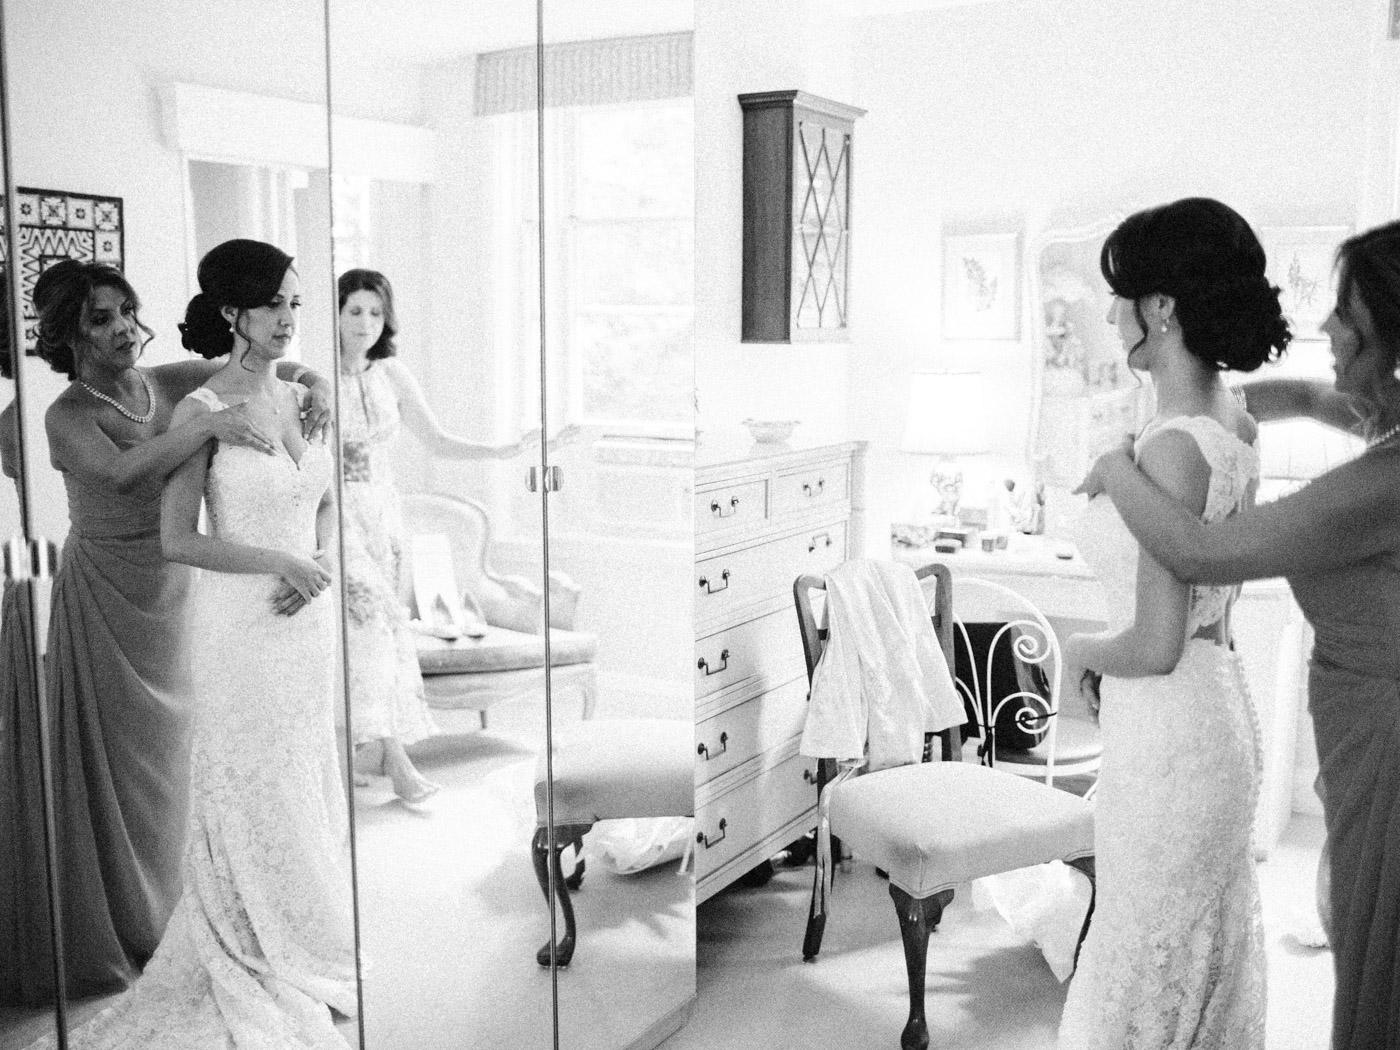 toronto_wedding_photographer_fine_art_documentary-69.jpg